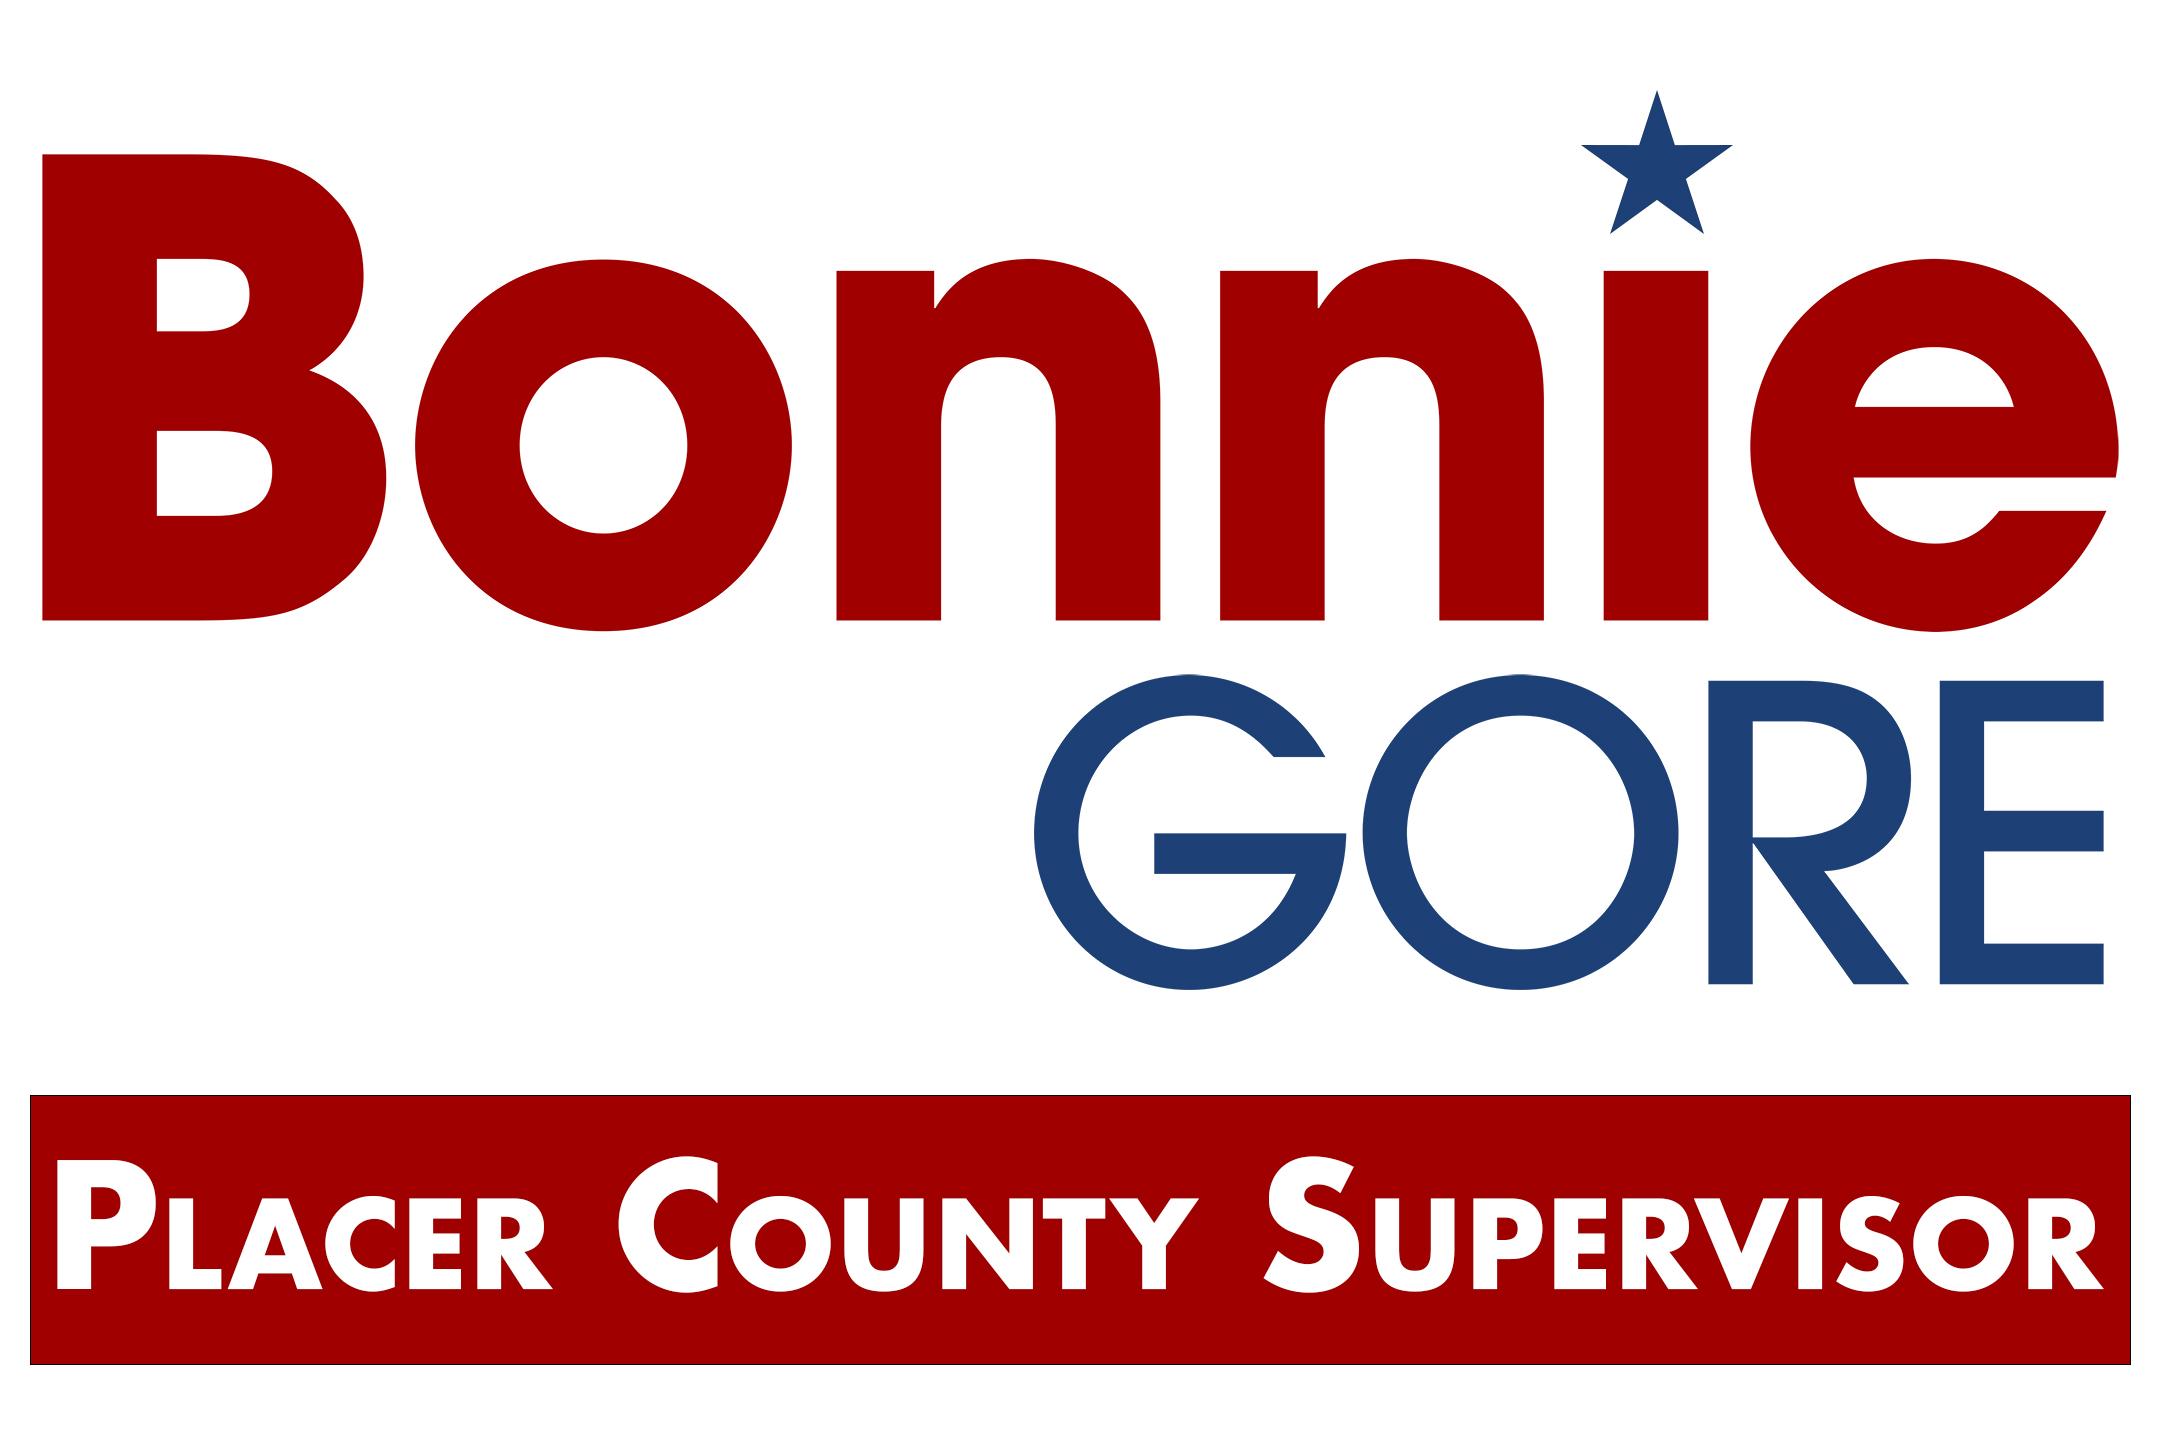 Bonnie Gore for Supervisor